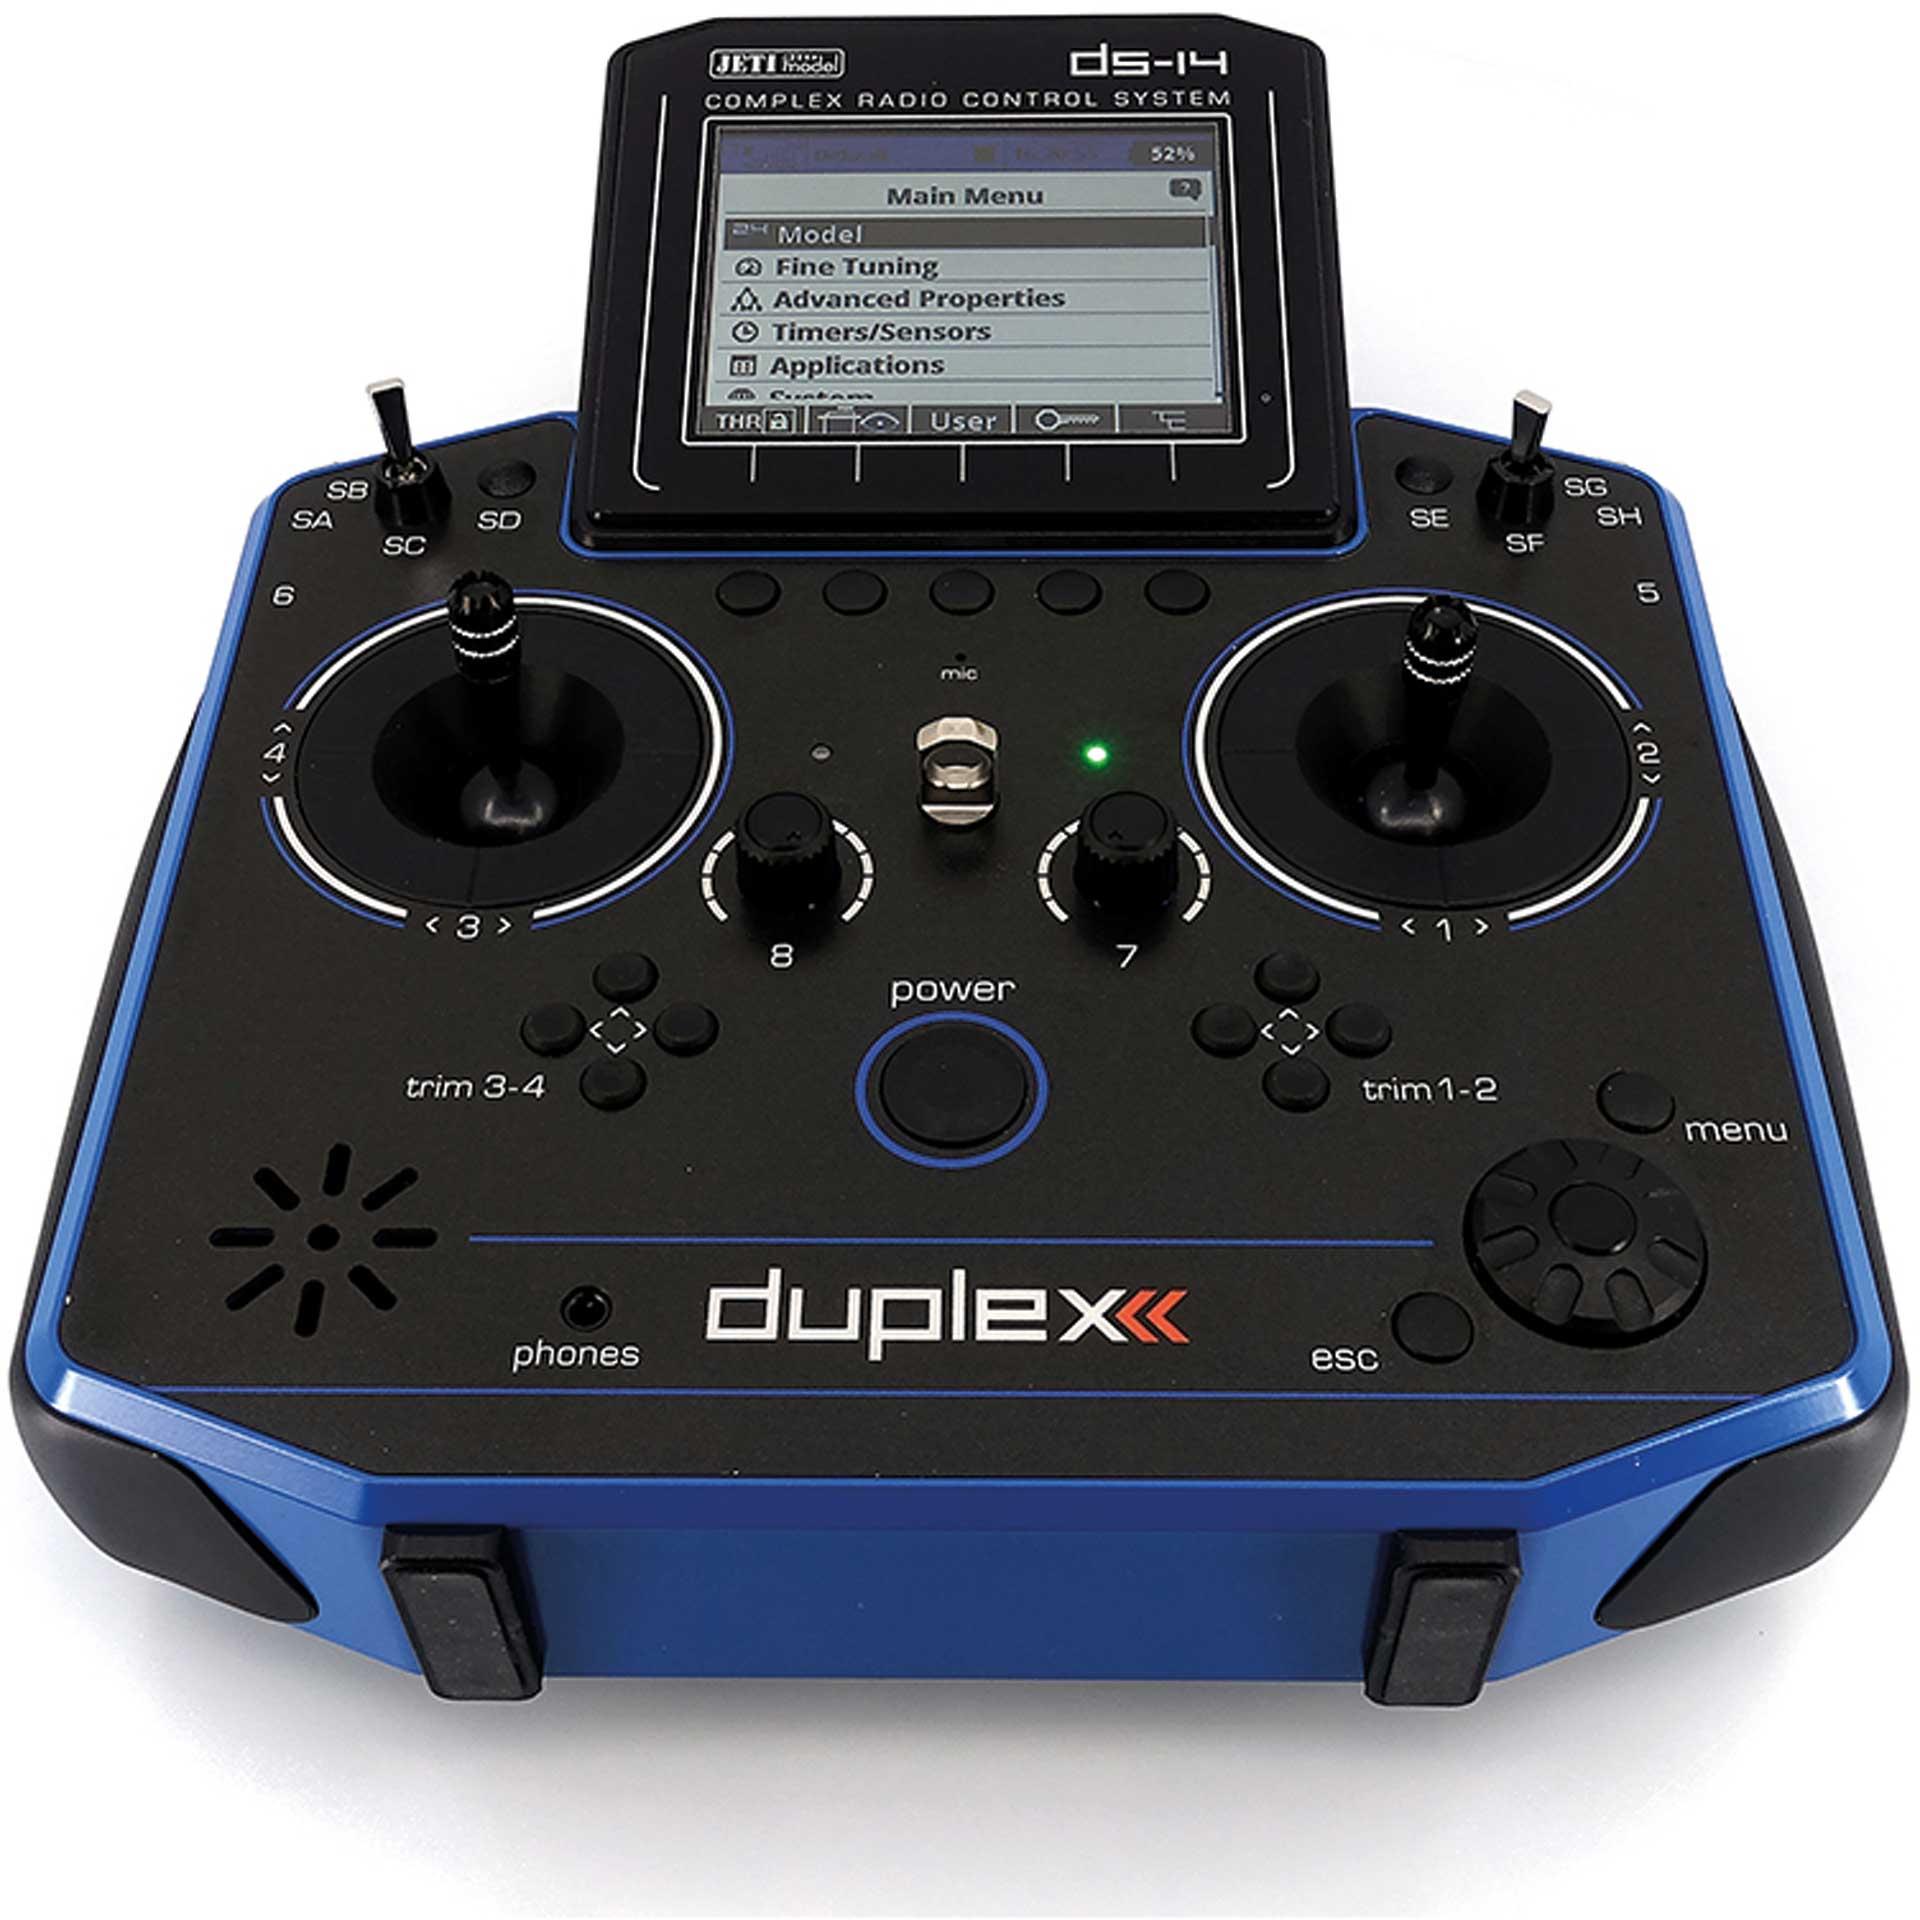 JETI DS-14 II BLEU   Multimode 2,4Ghz Radiocommande RC